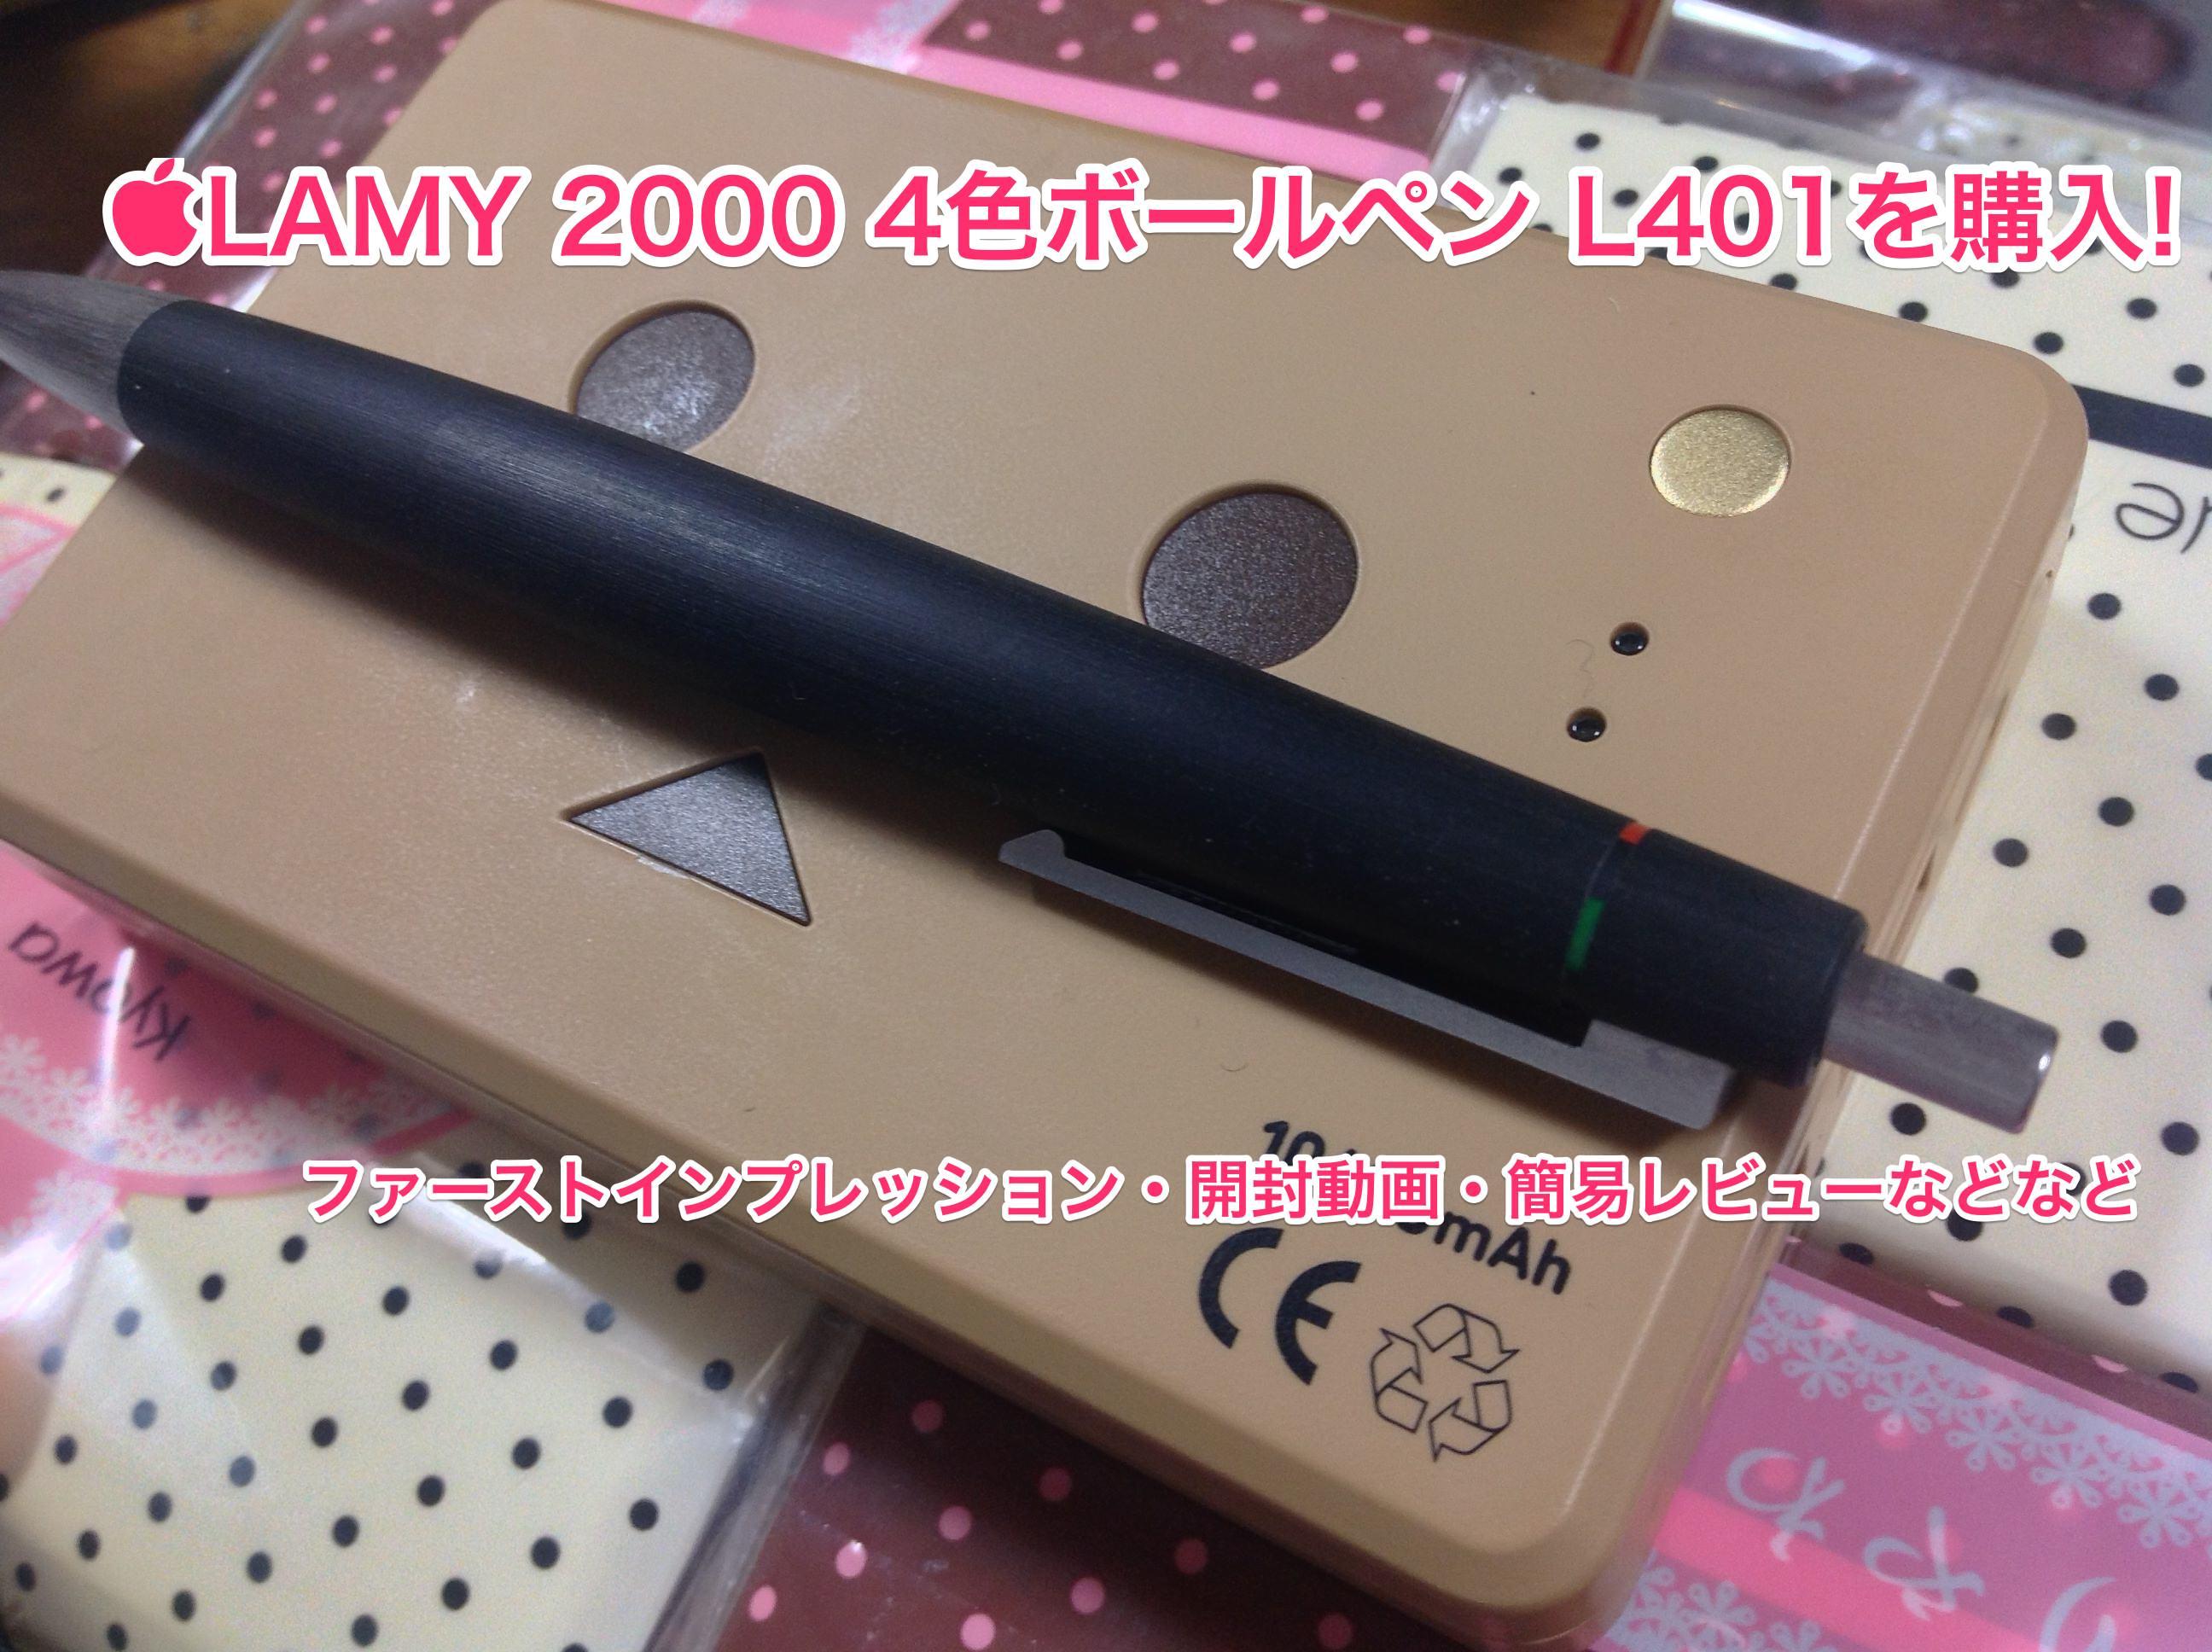 LAMY 2000 4色ボールペン L401購入&レビュー